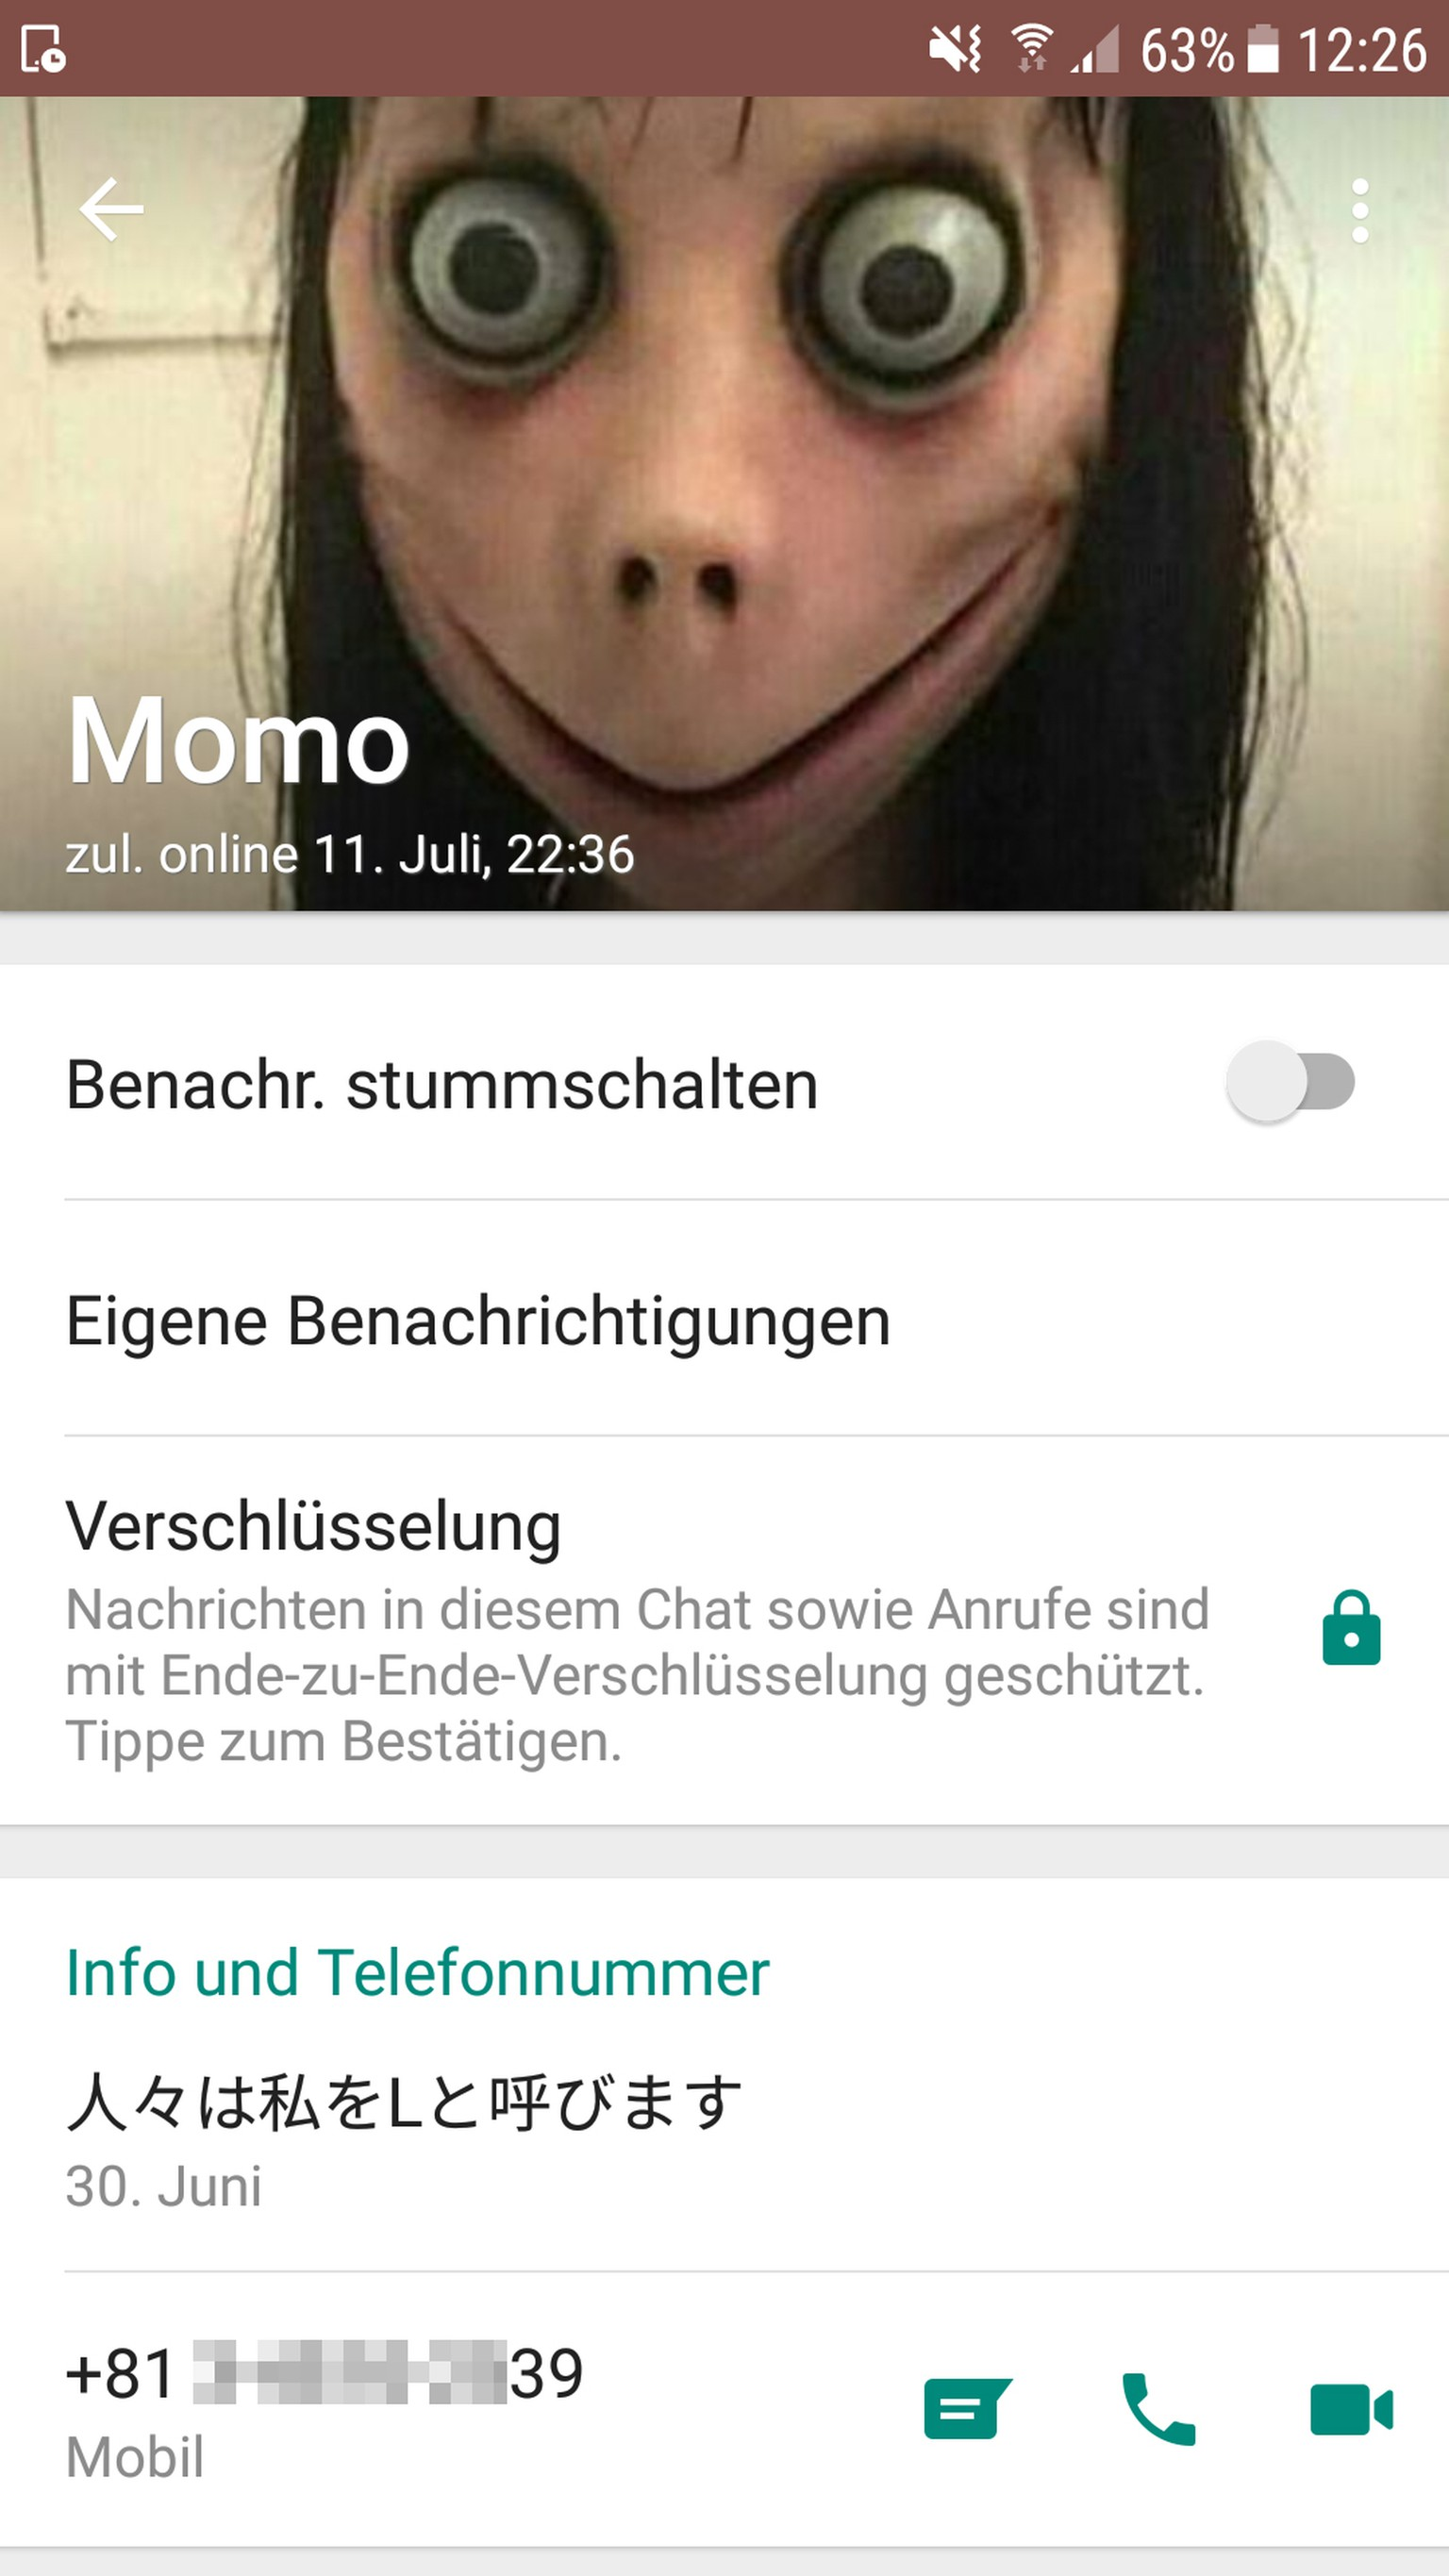 Momo Nummern